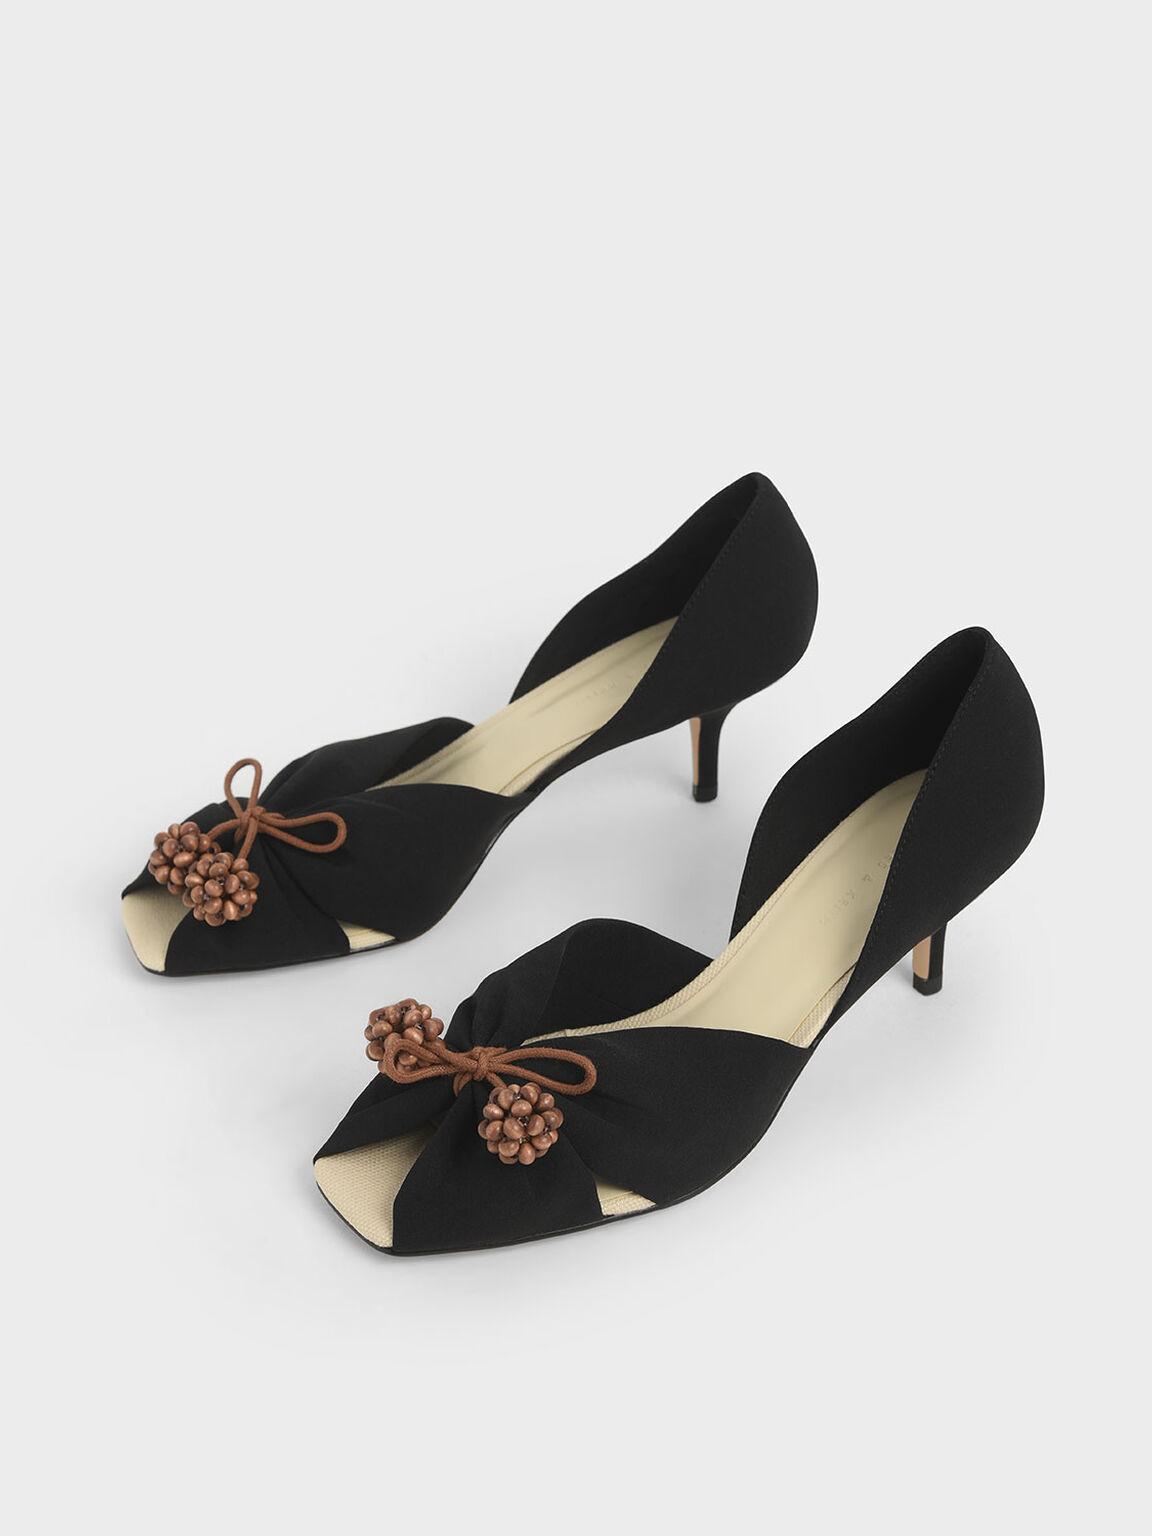 Cherry Embellished Peep-Toe D'Orsay Pumps, Black, hi-res